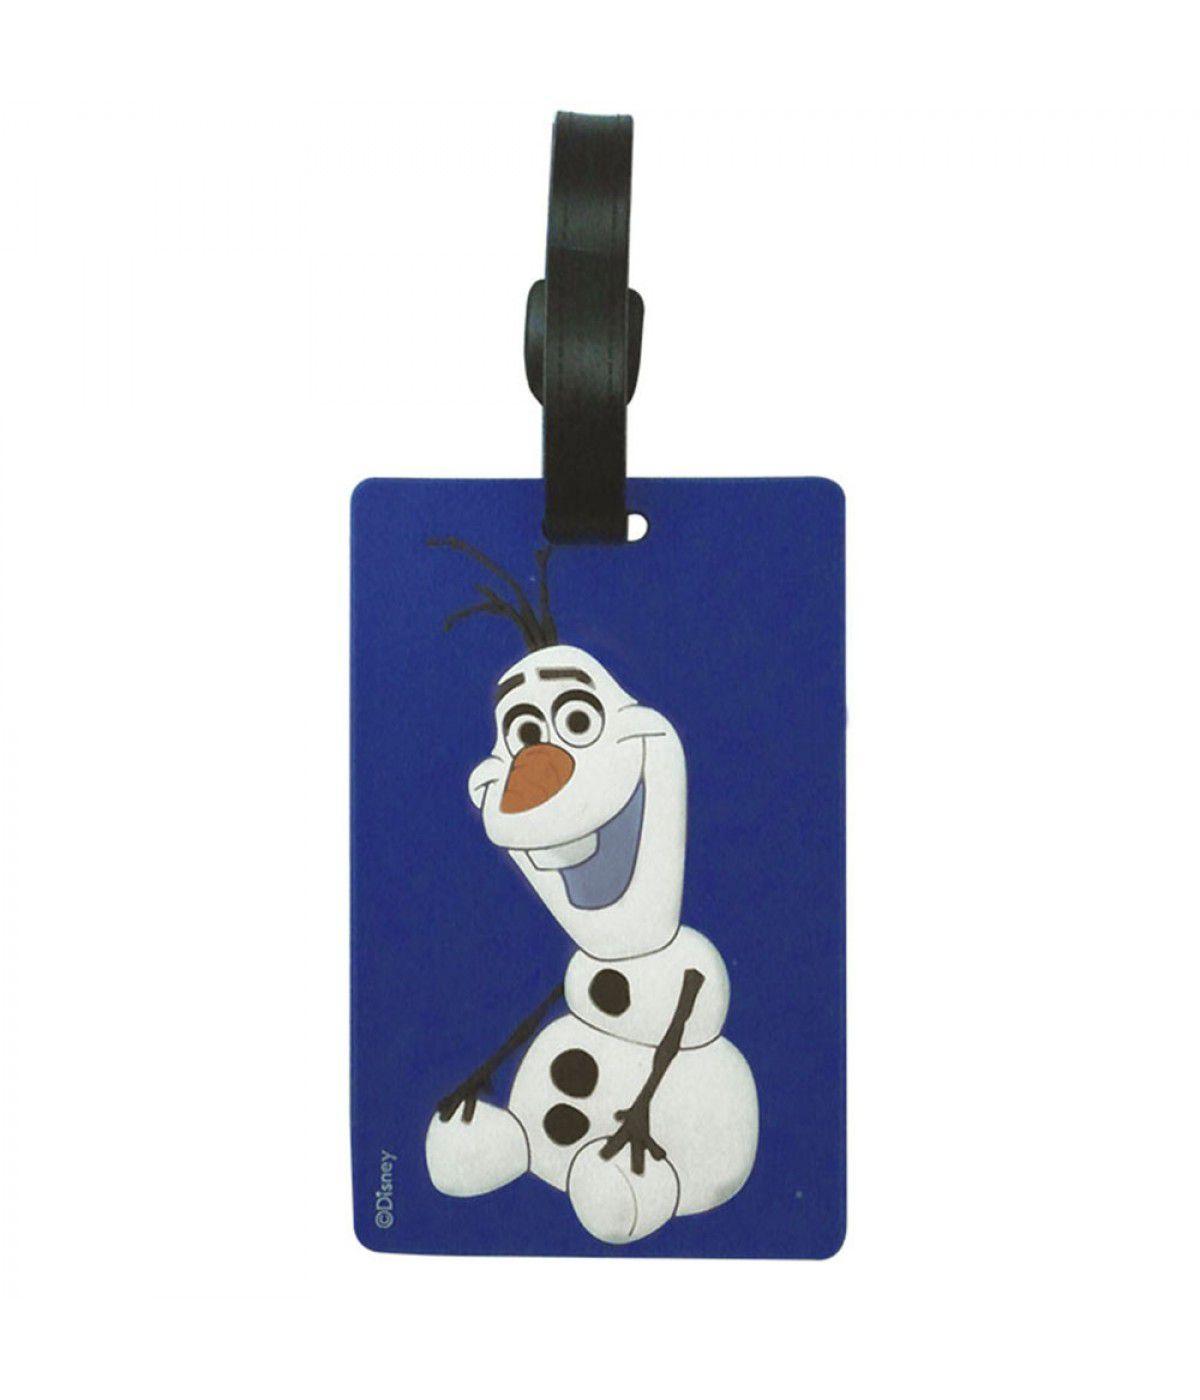 Identificador para Mala (Luggage Tag) Olaf: Frozen (Disney)